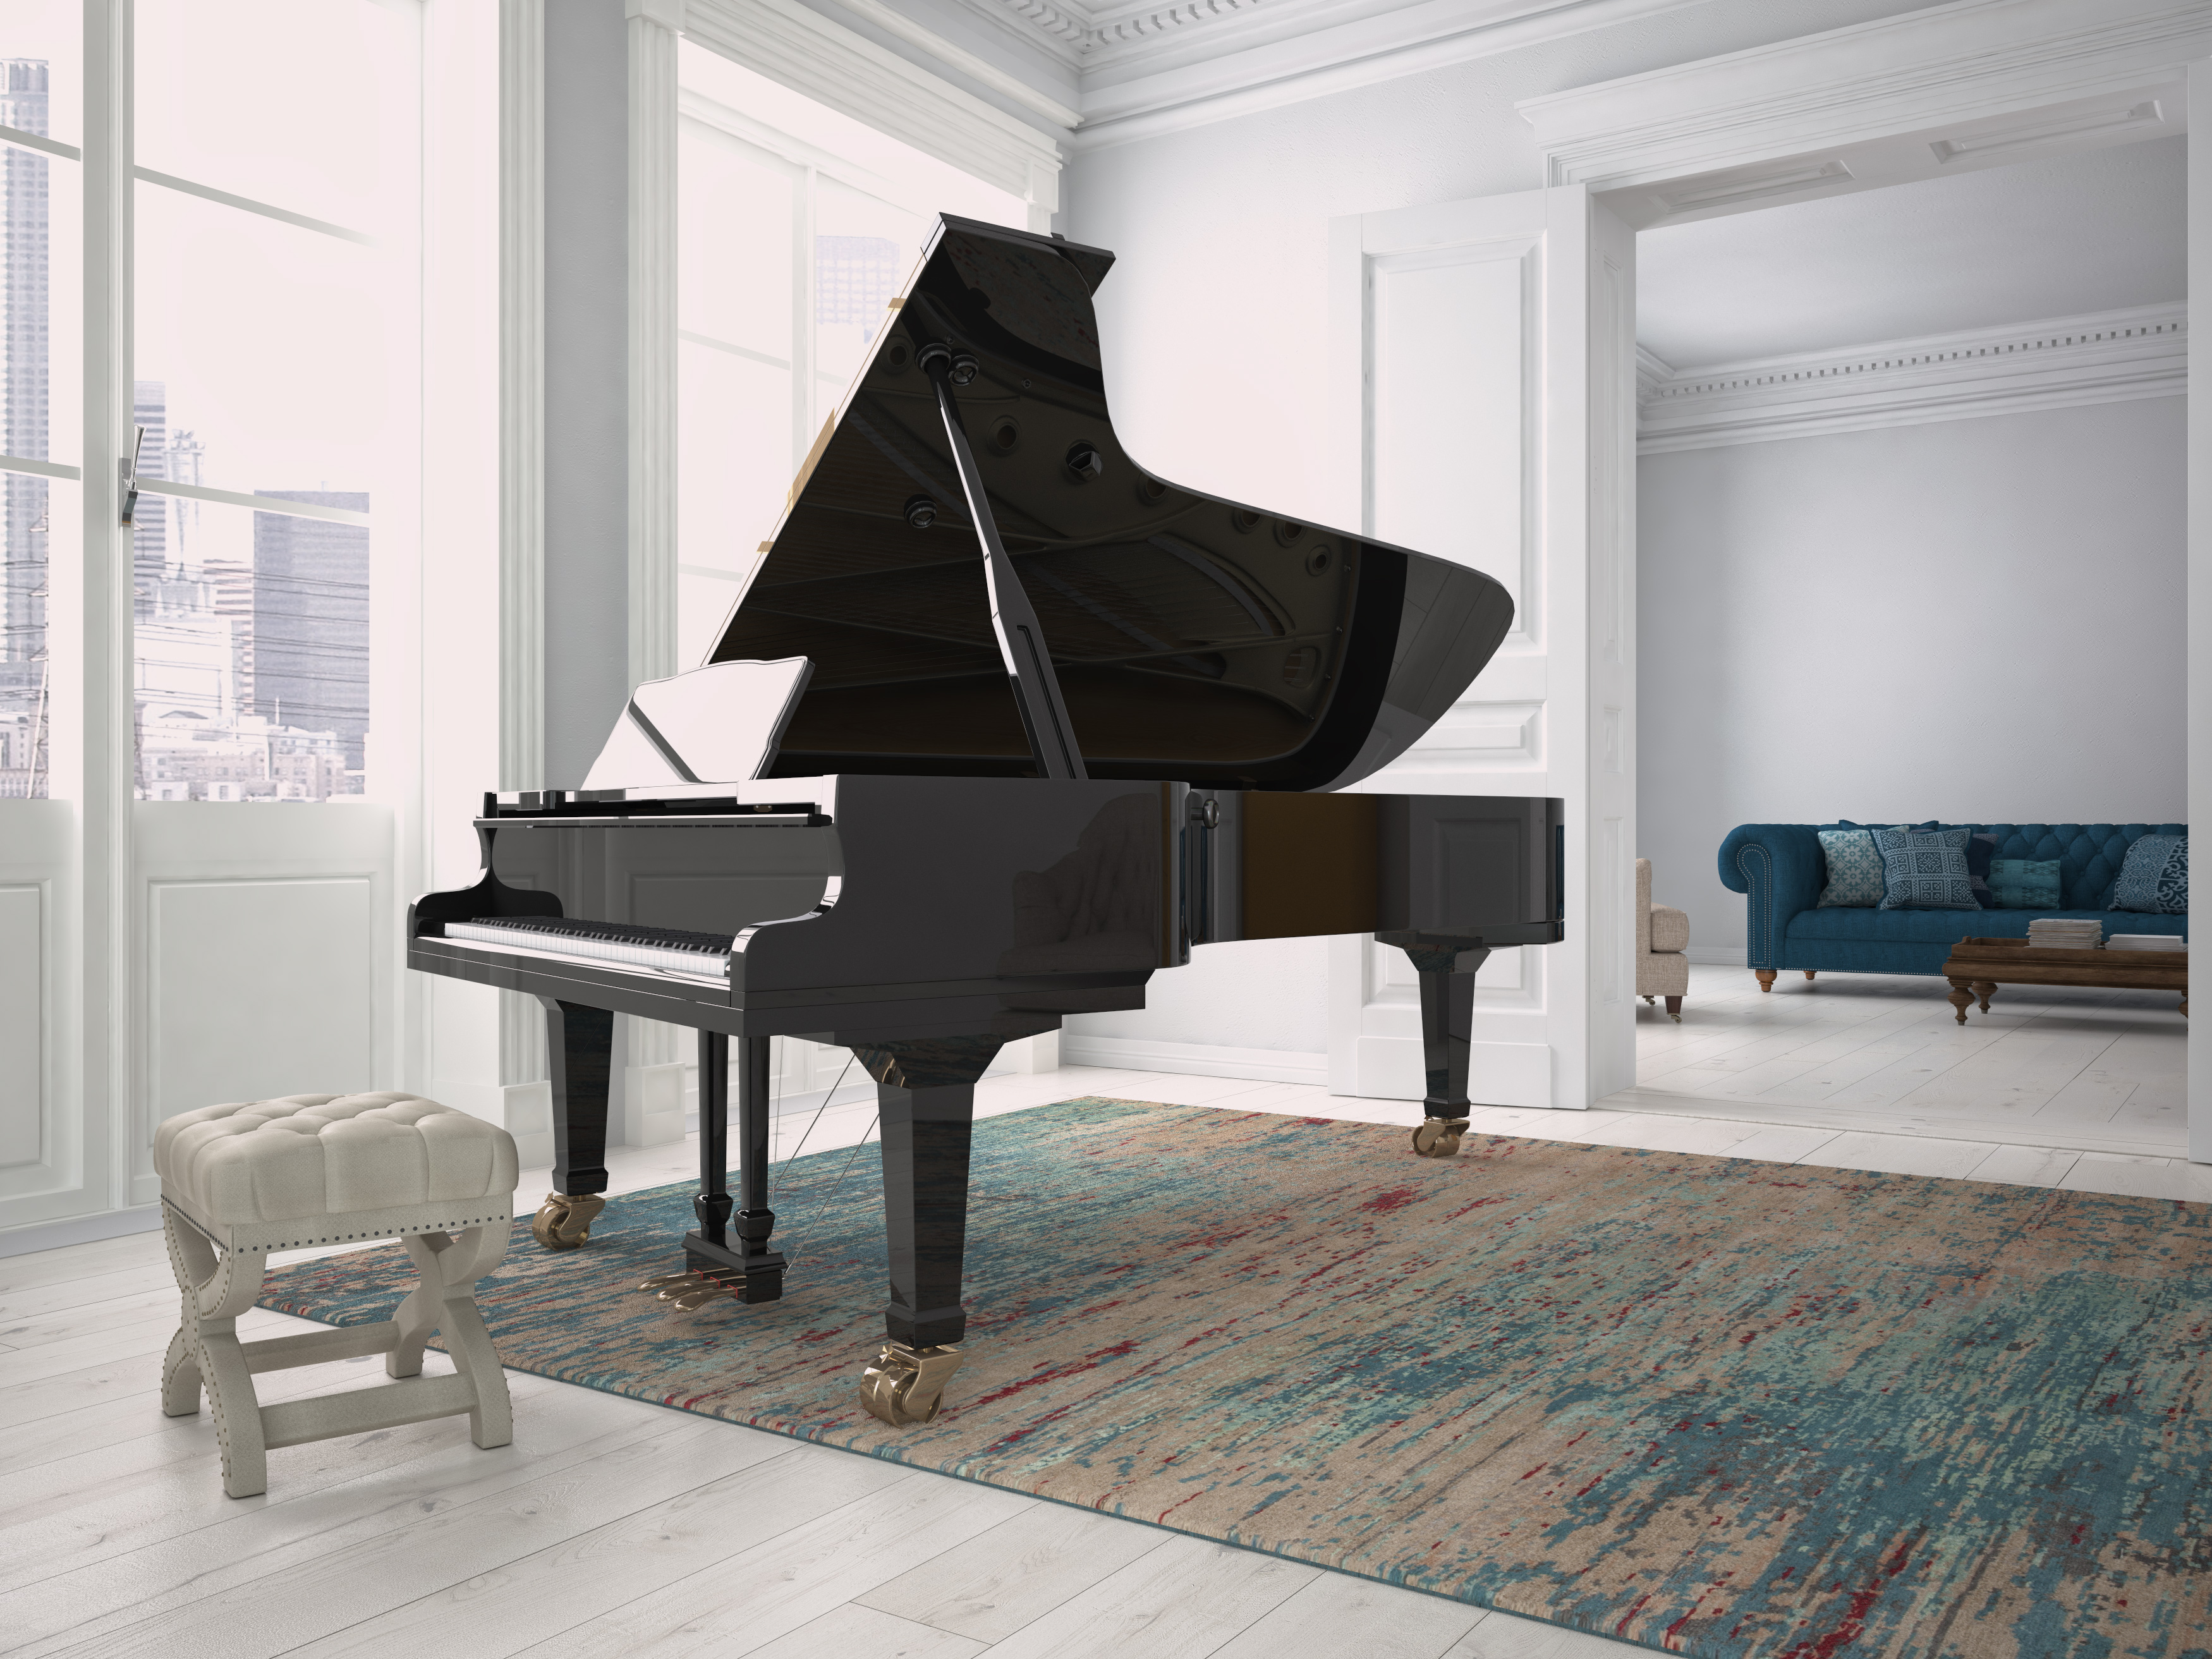 Piano teacher studio